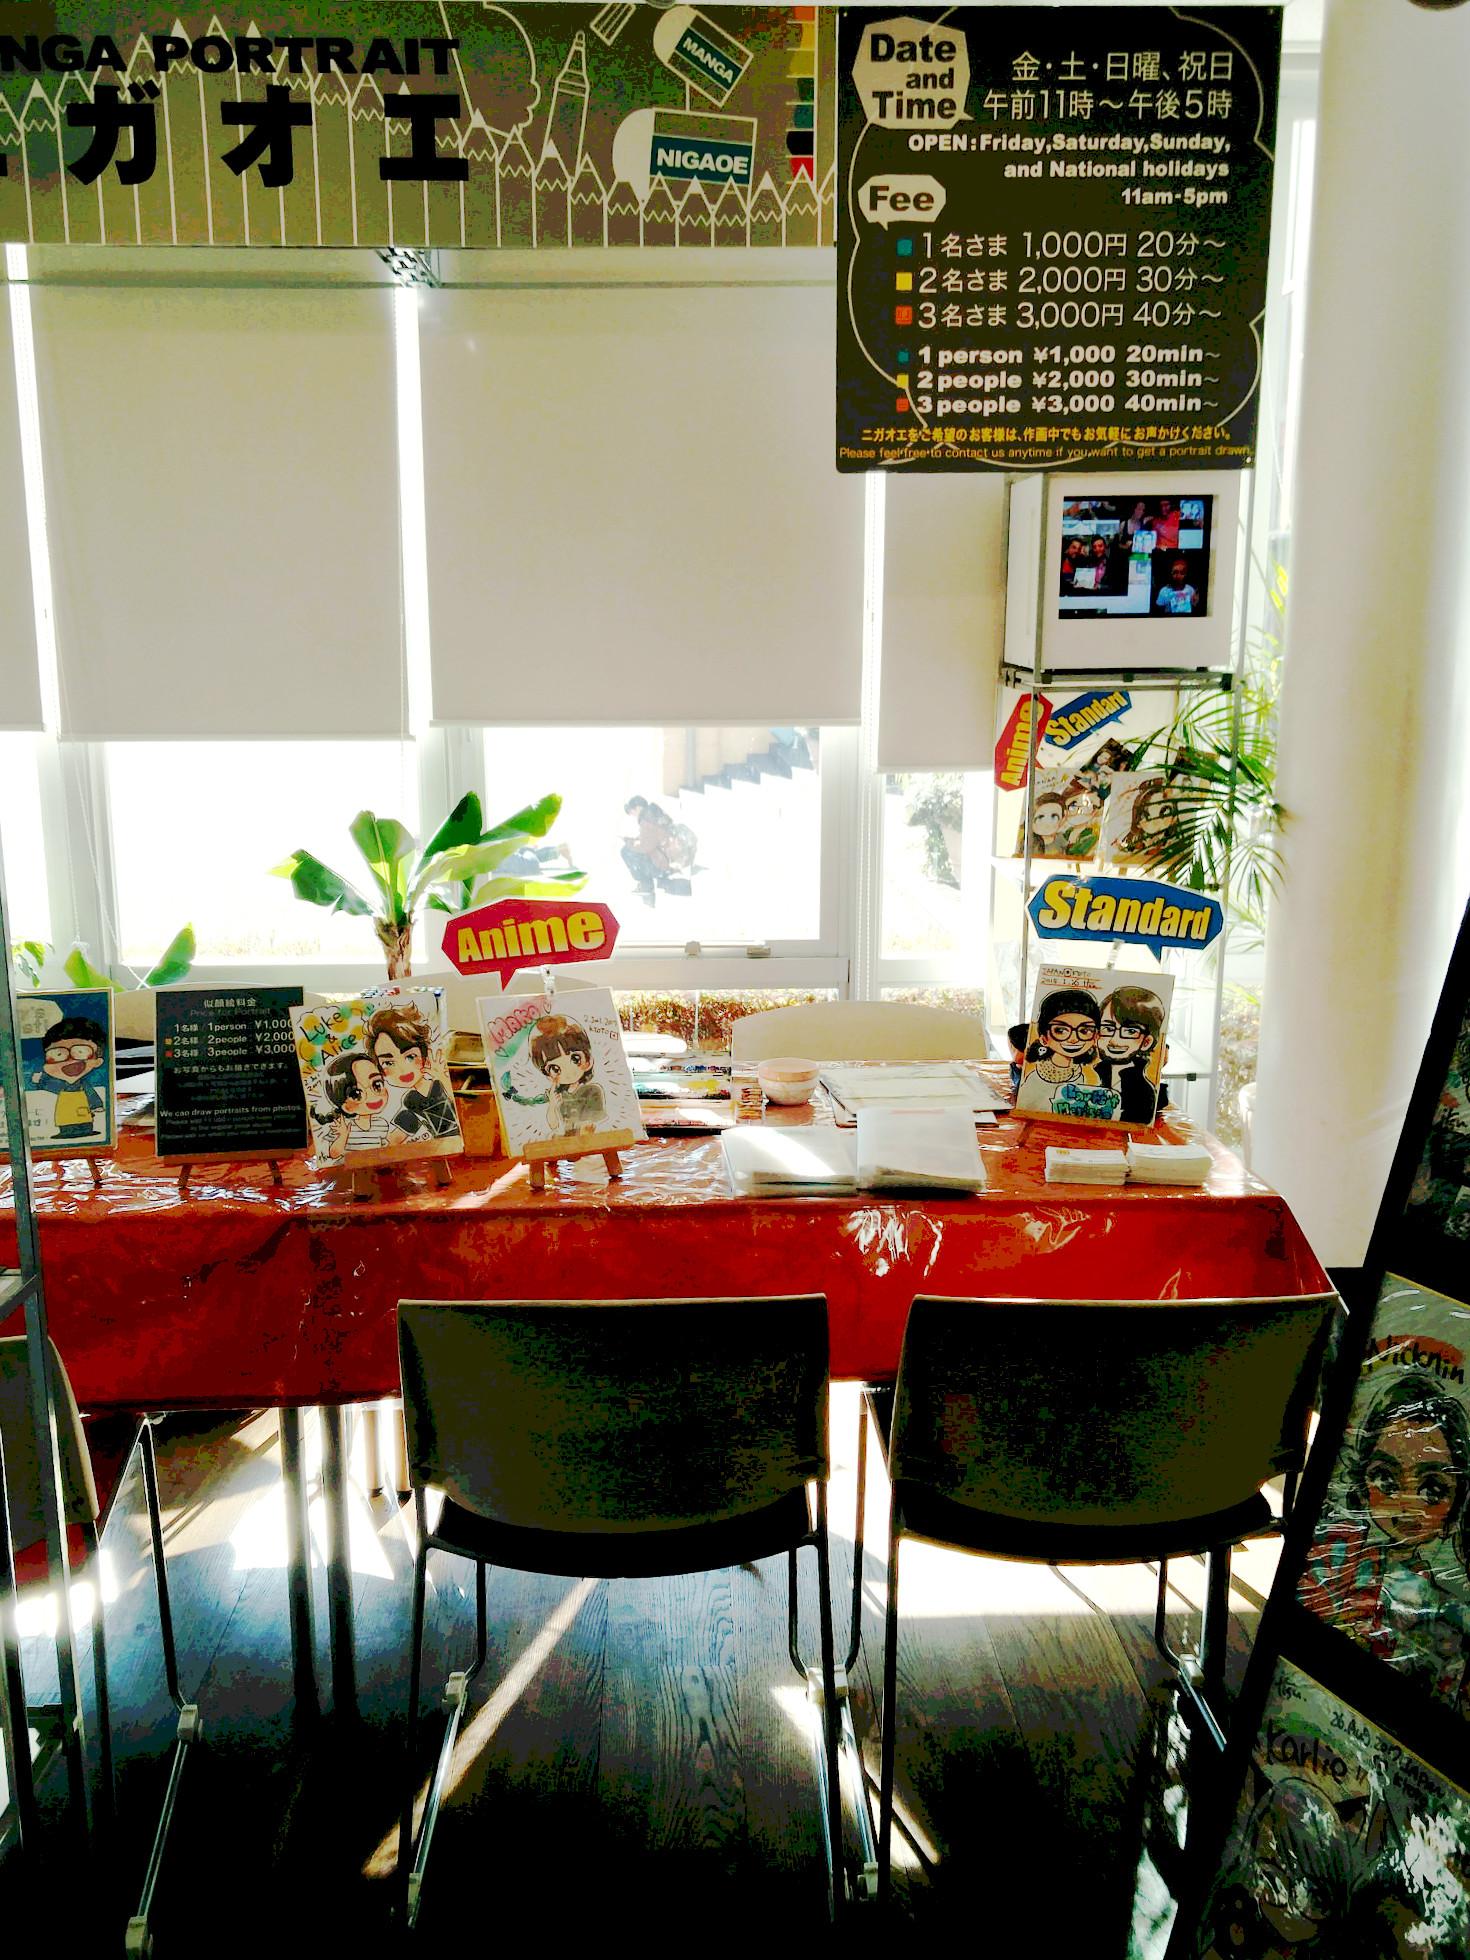 Kyoto Manga Museum: Lass dich als Manga-Figur zeichnen in der Manga Portrait Corner!